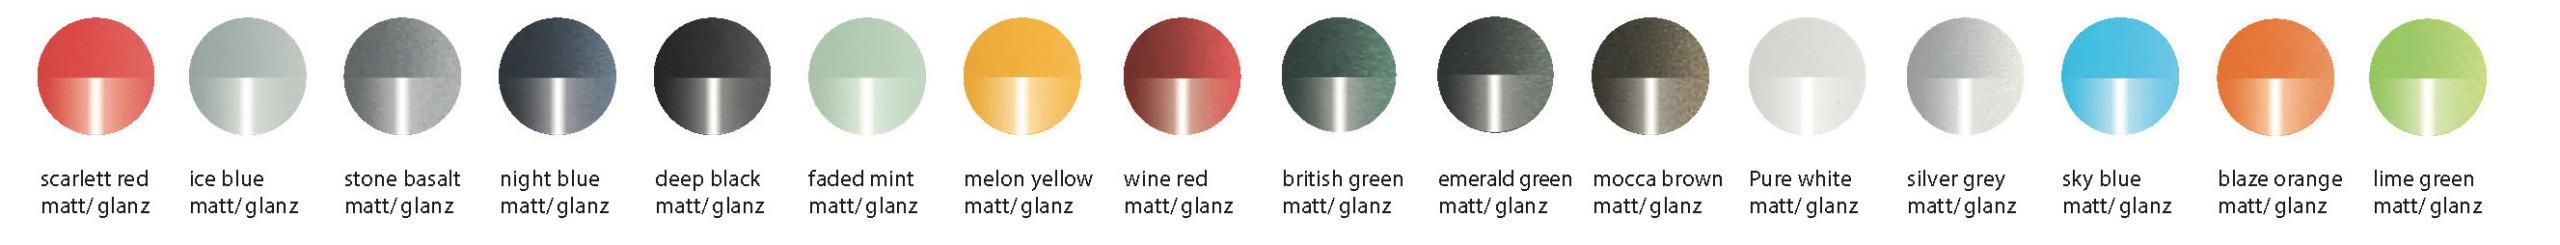 VeloDeVille Farben